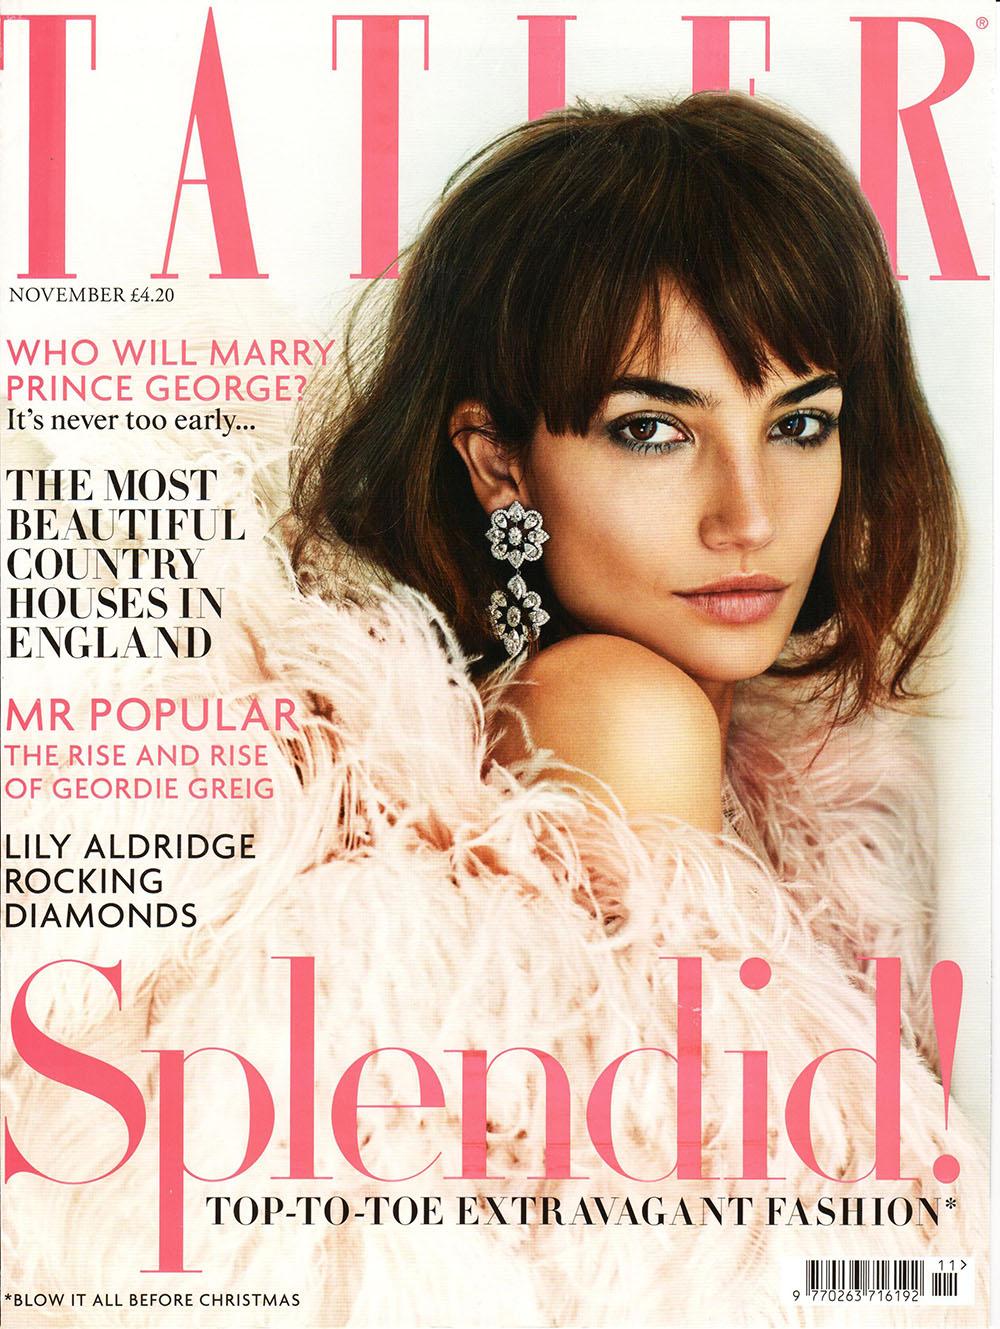 Tatler Nov 2013 cover.jpg